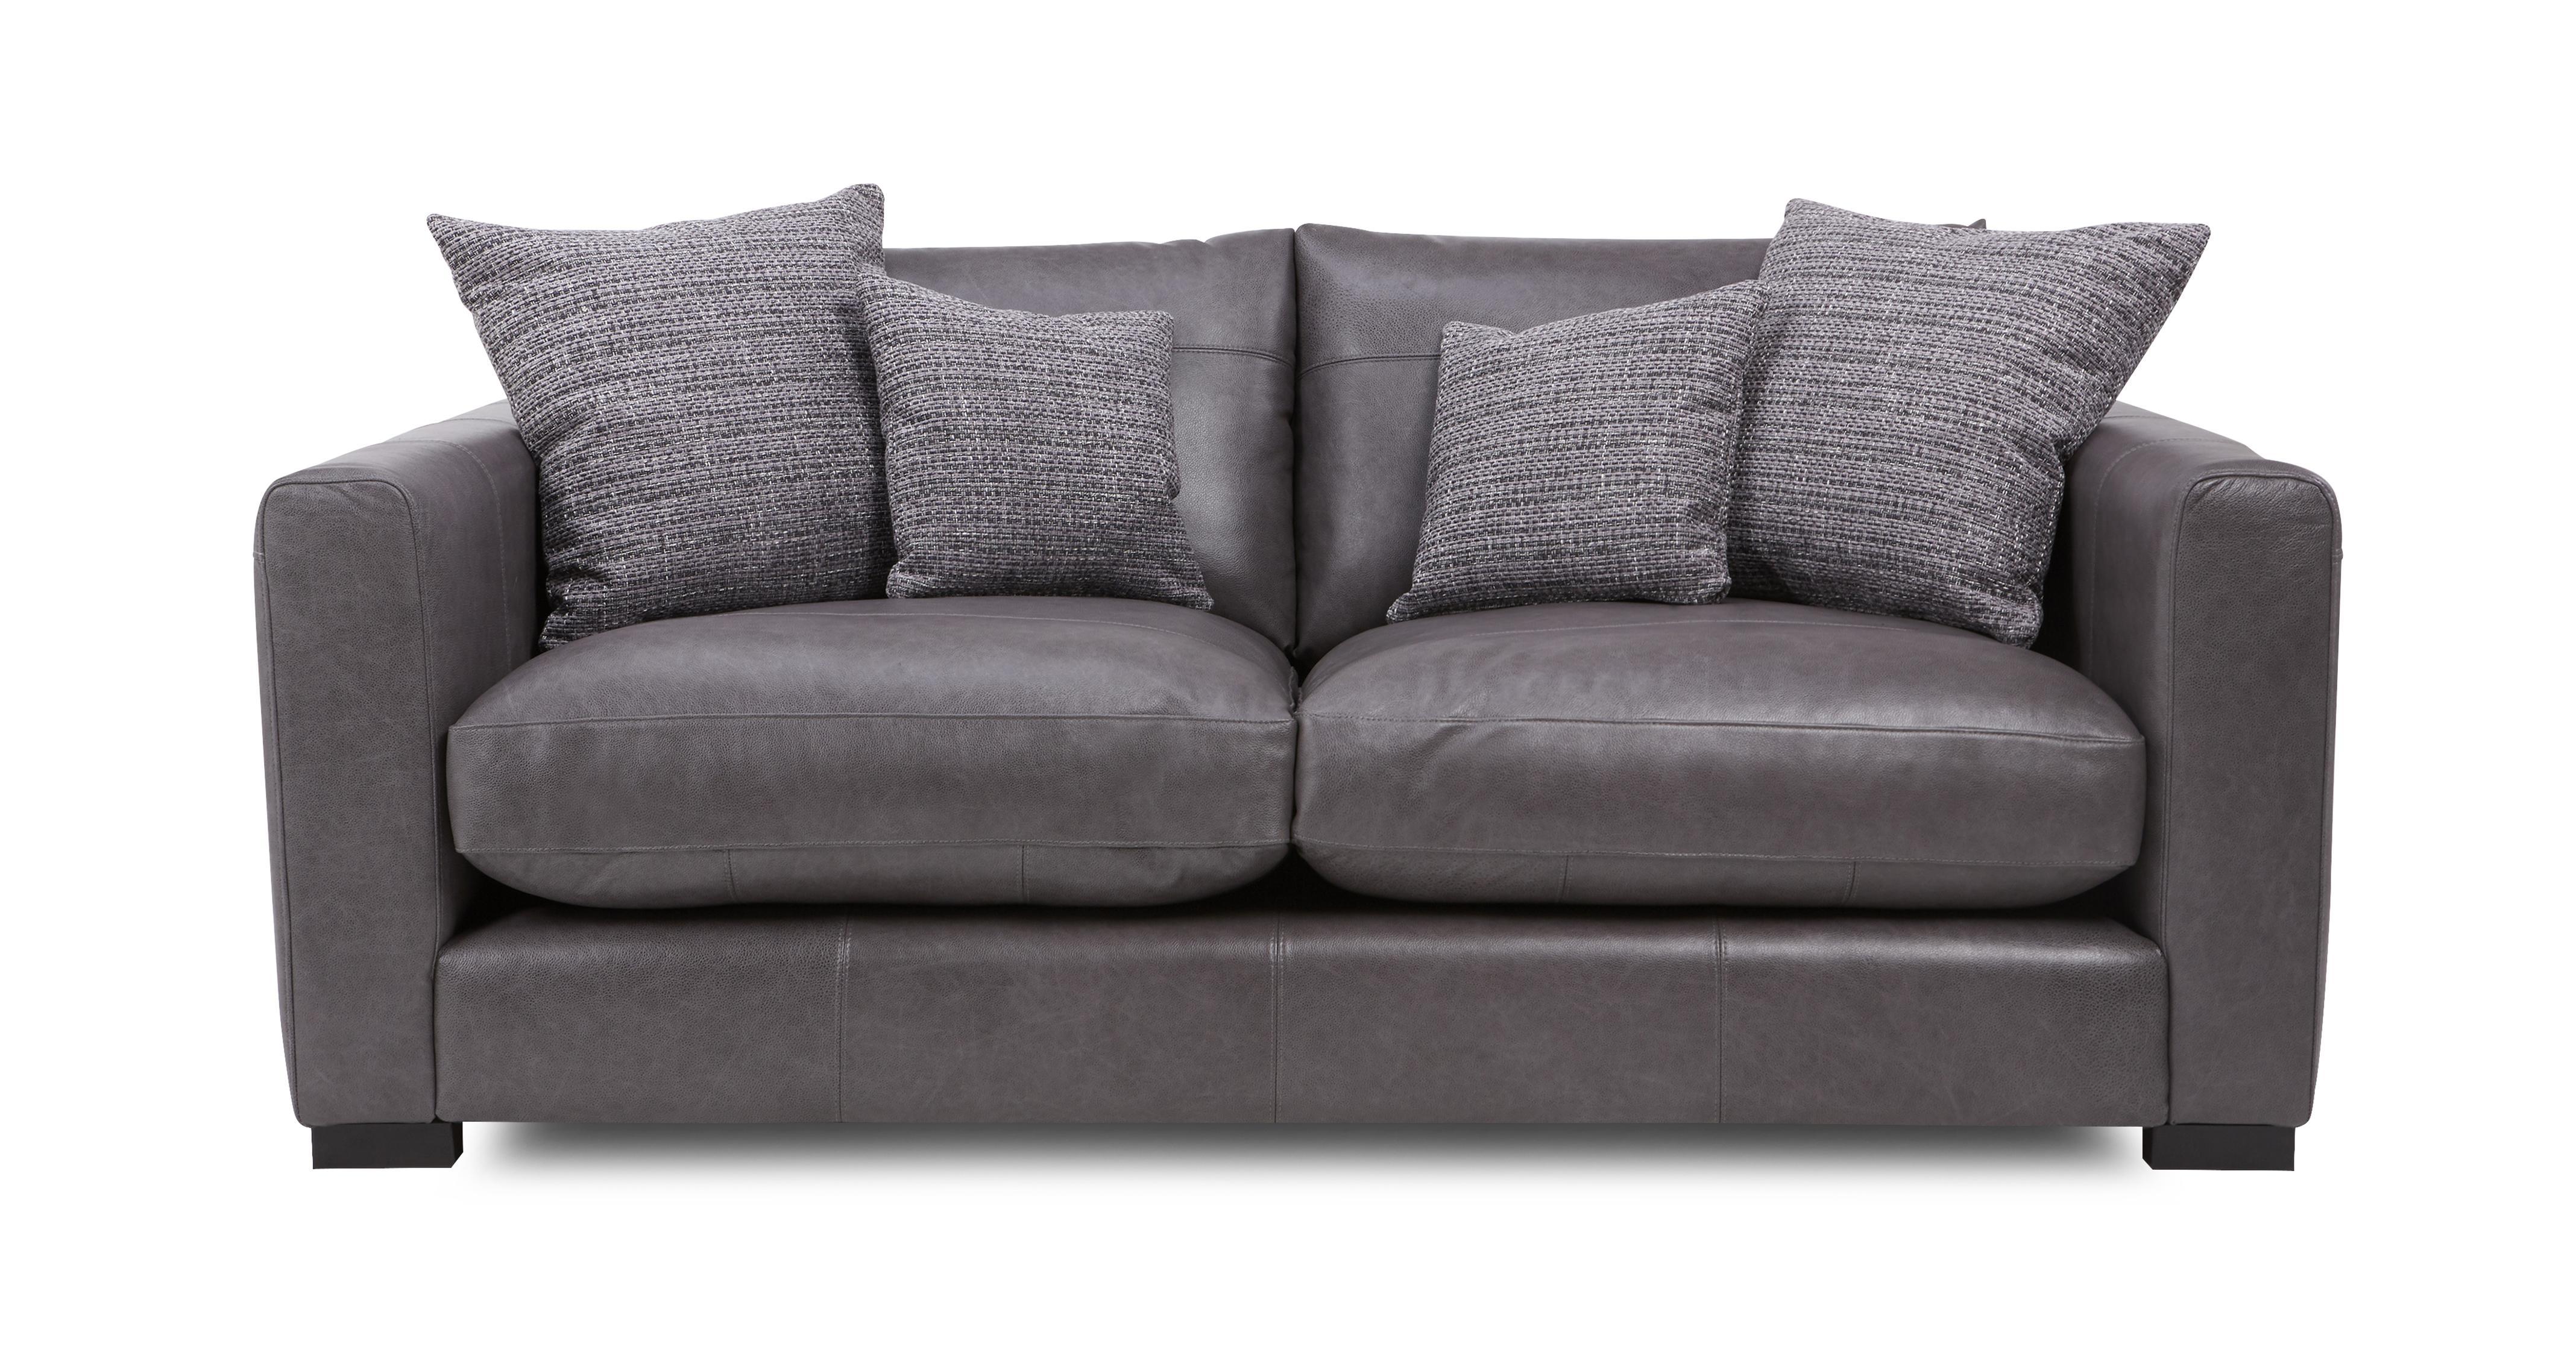 Dillon Leather Small Sofa Dfs Ireland